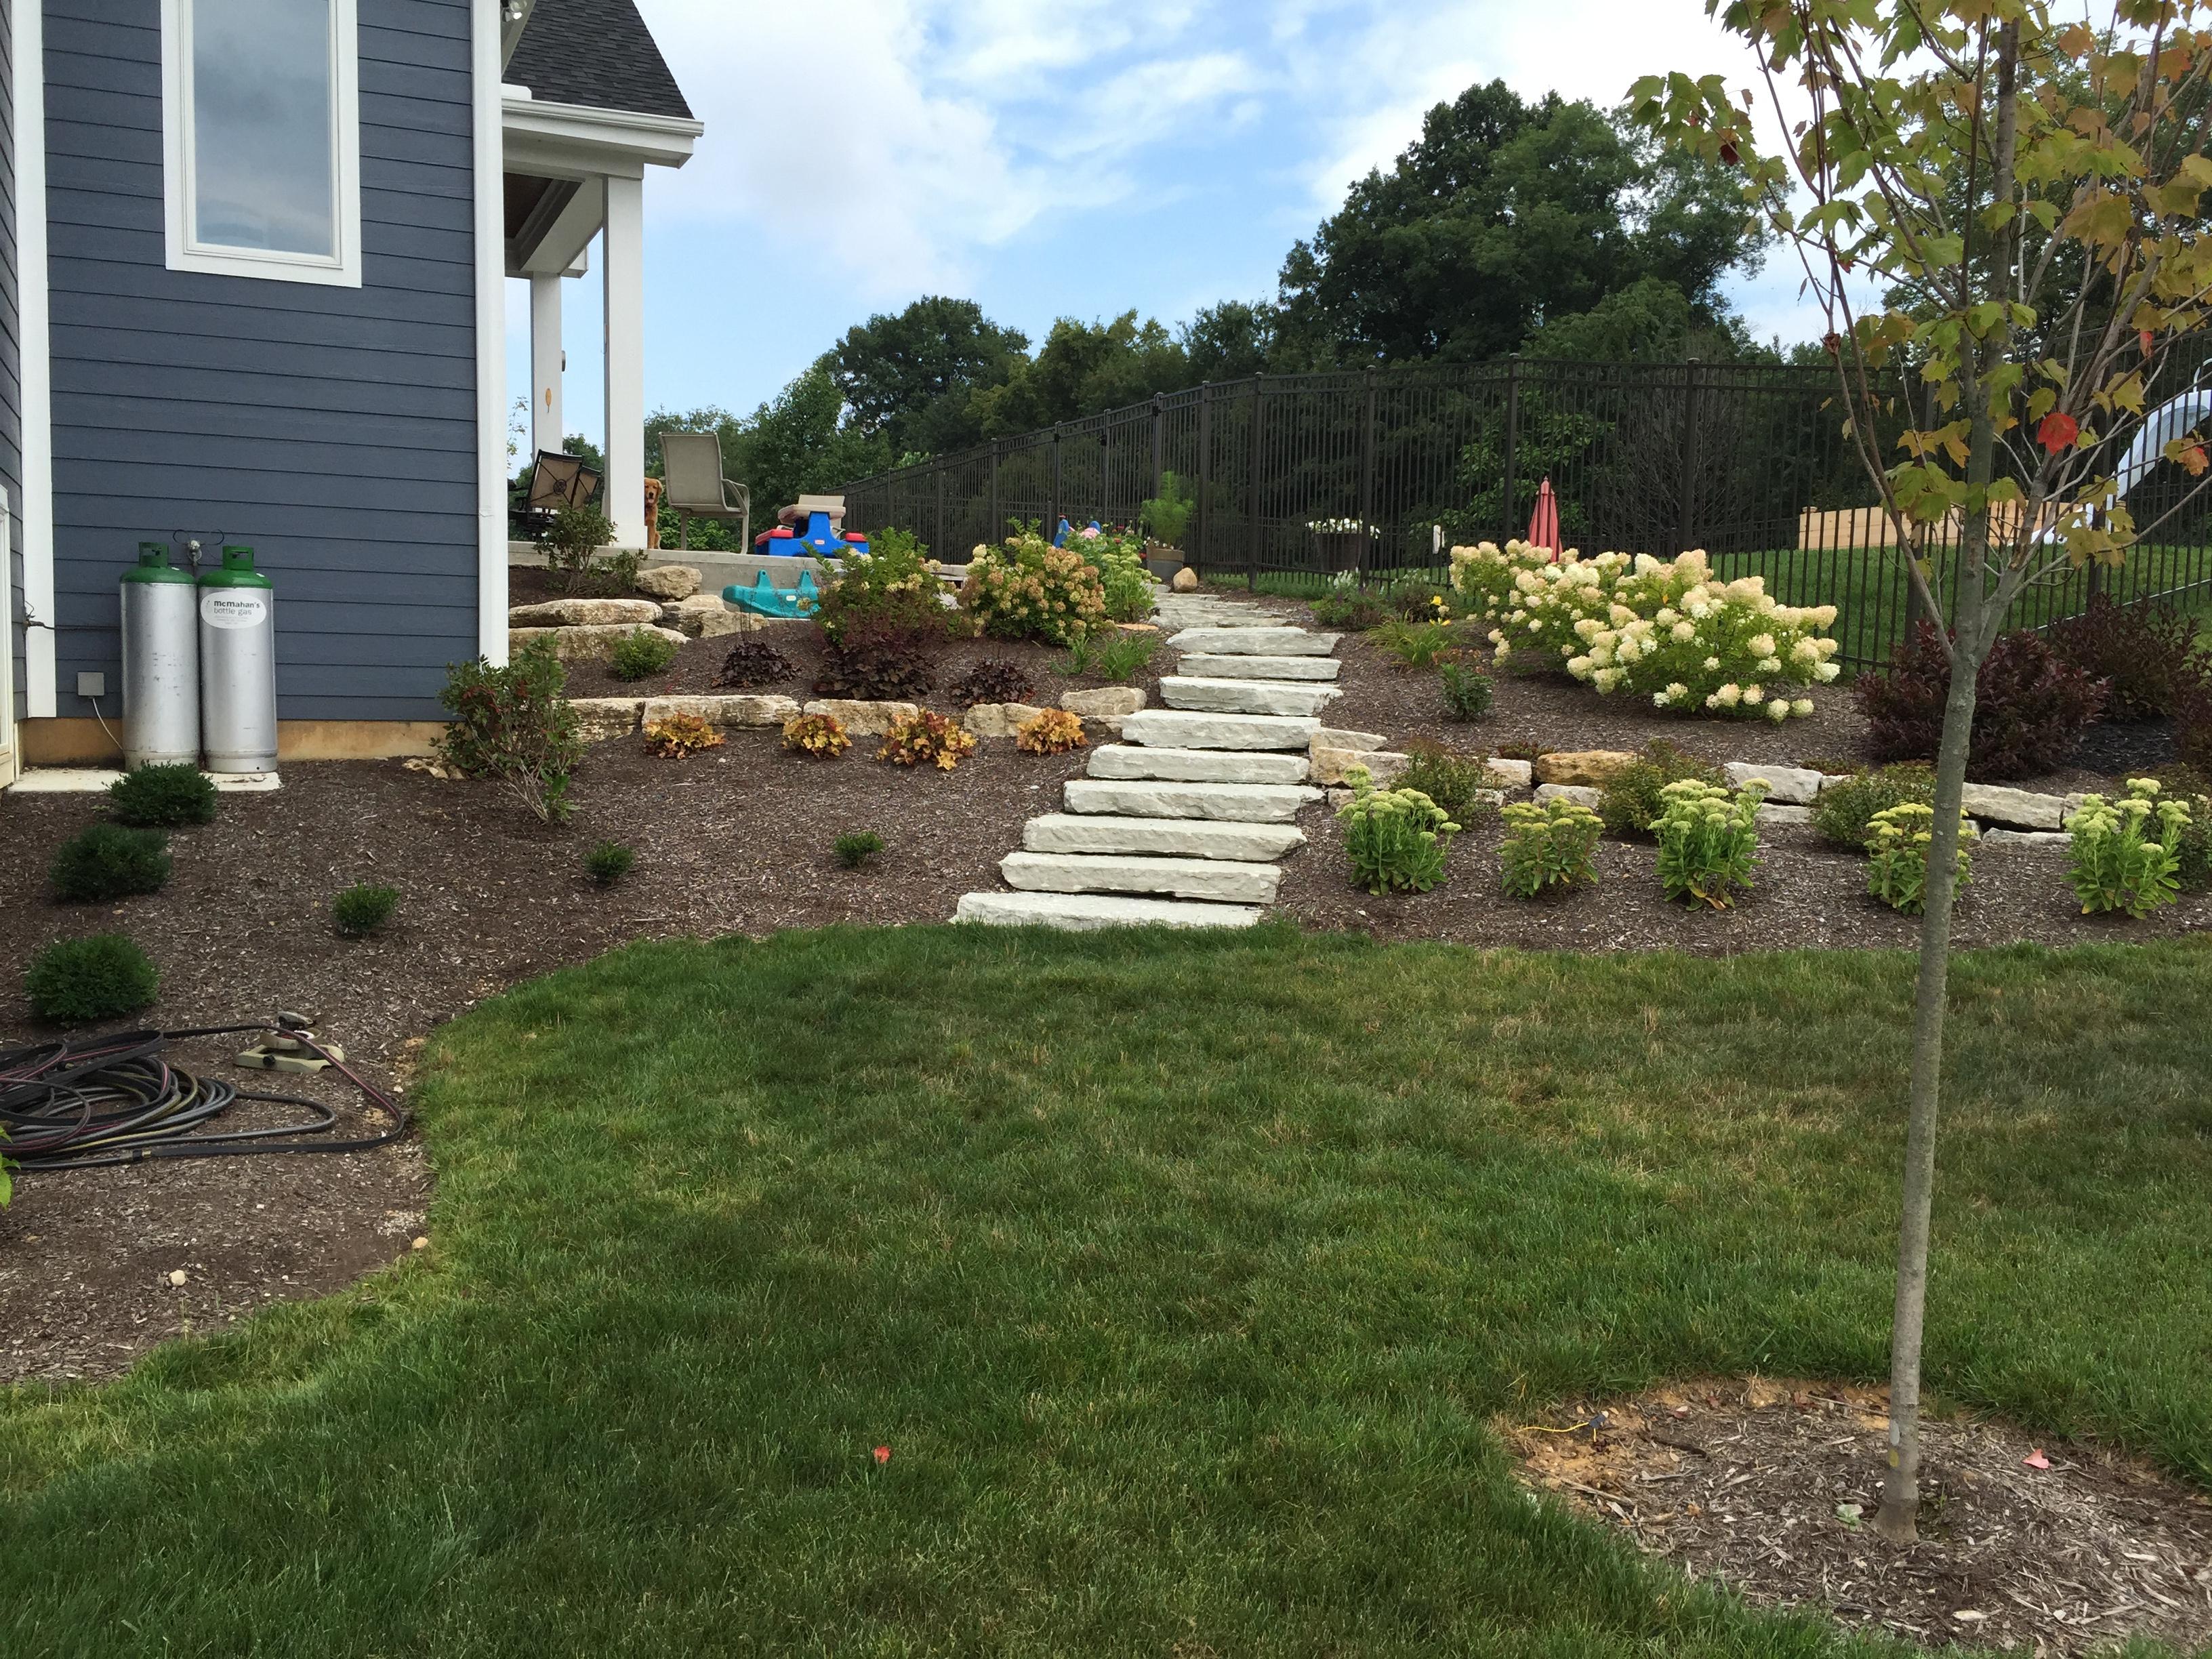 Buckeye Lawn & Landscaping Dayton OH